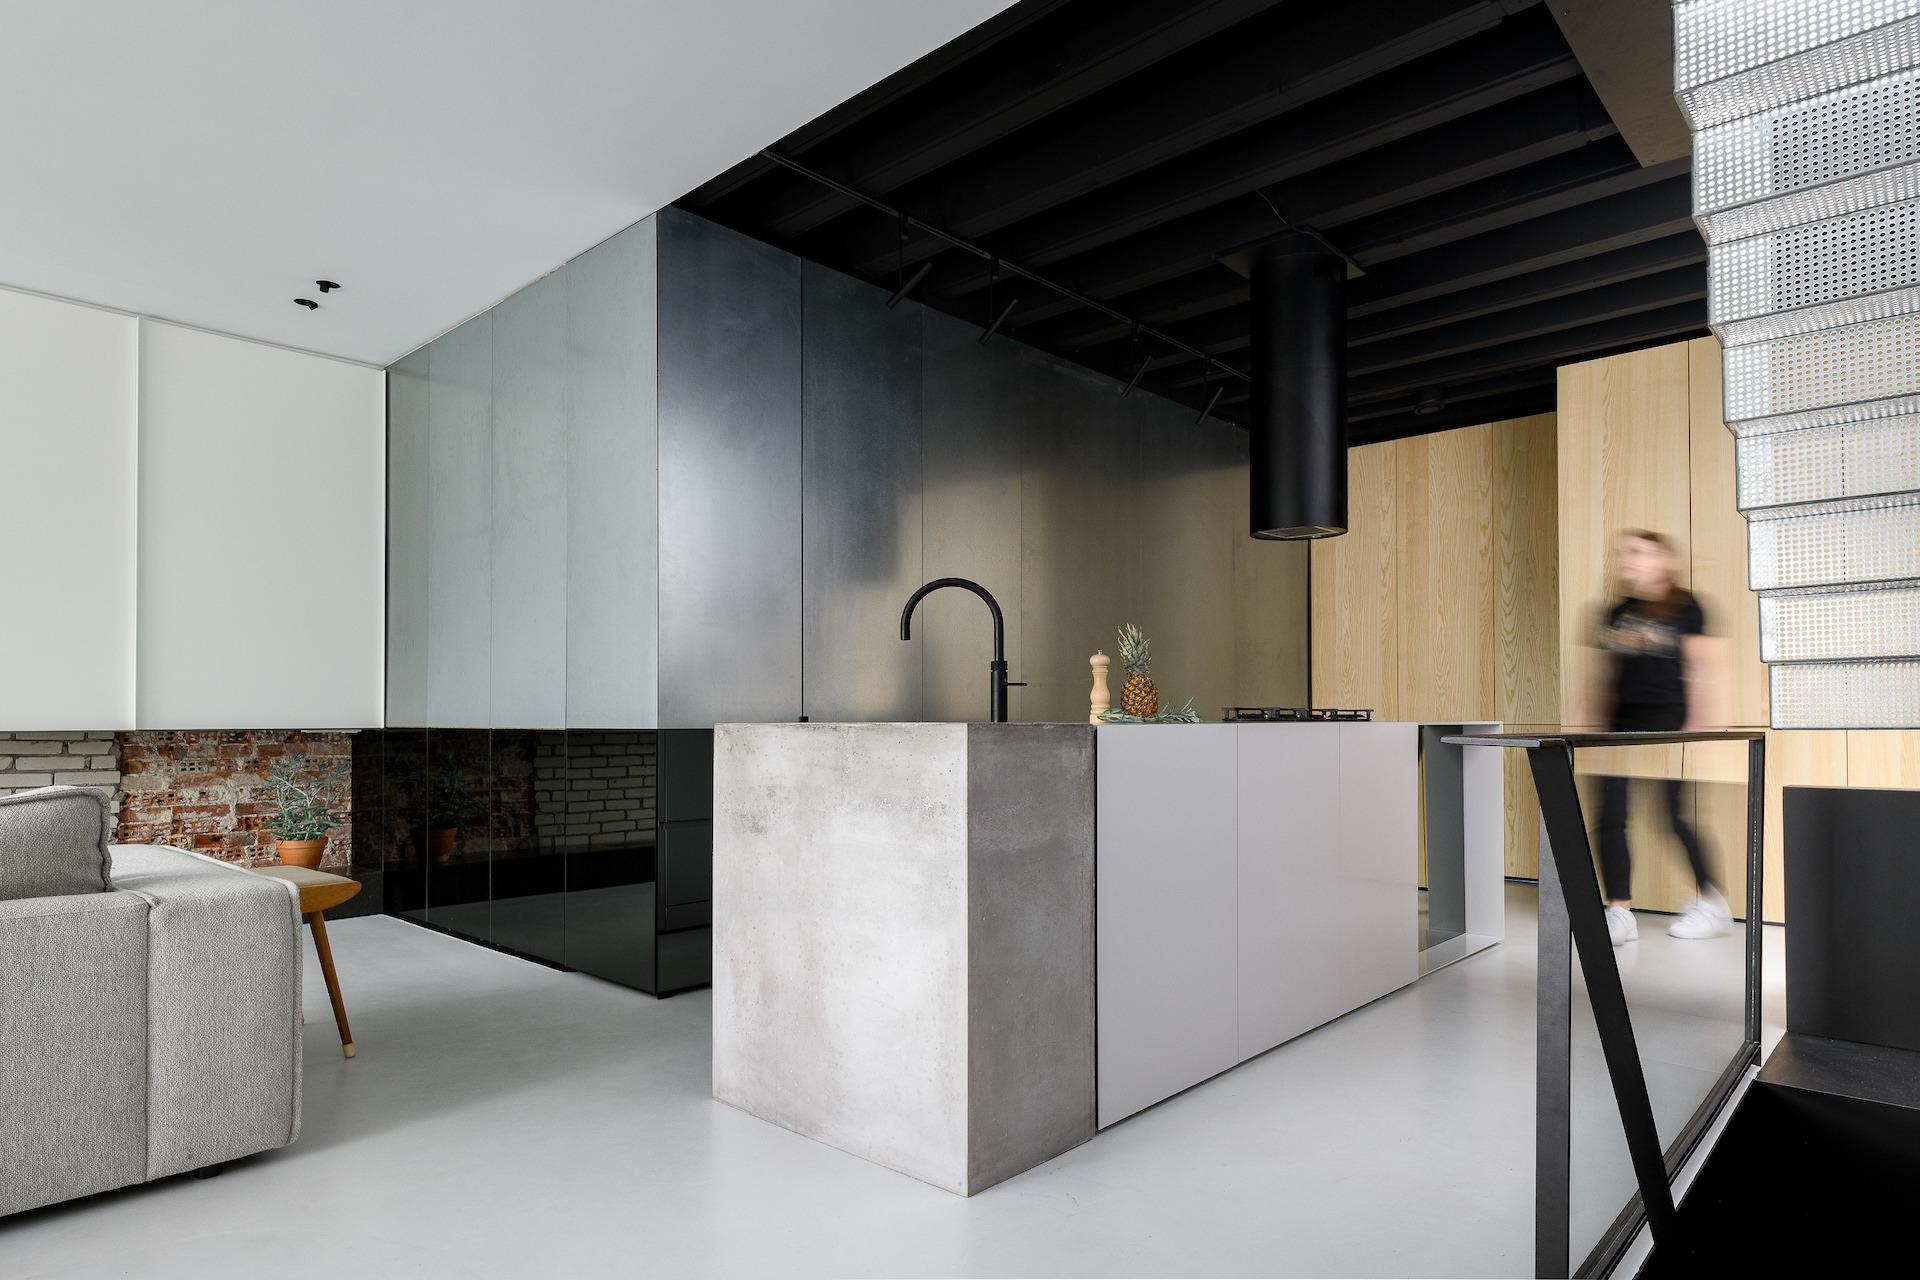 Transformation d'un grenier en appartement à Amsterdam - Journal du Design